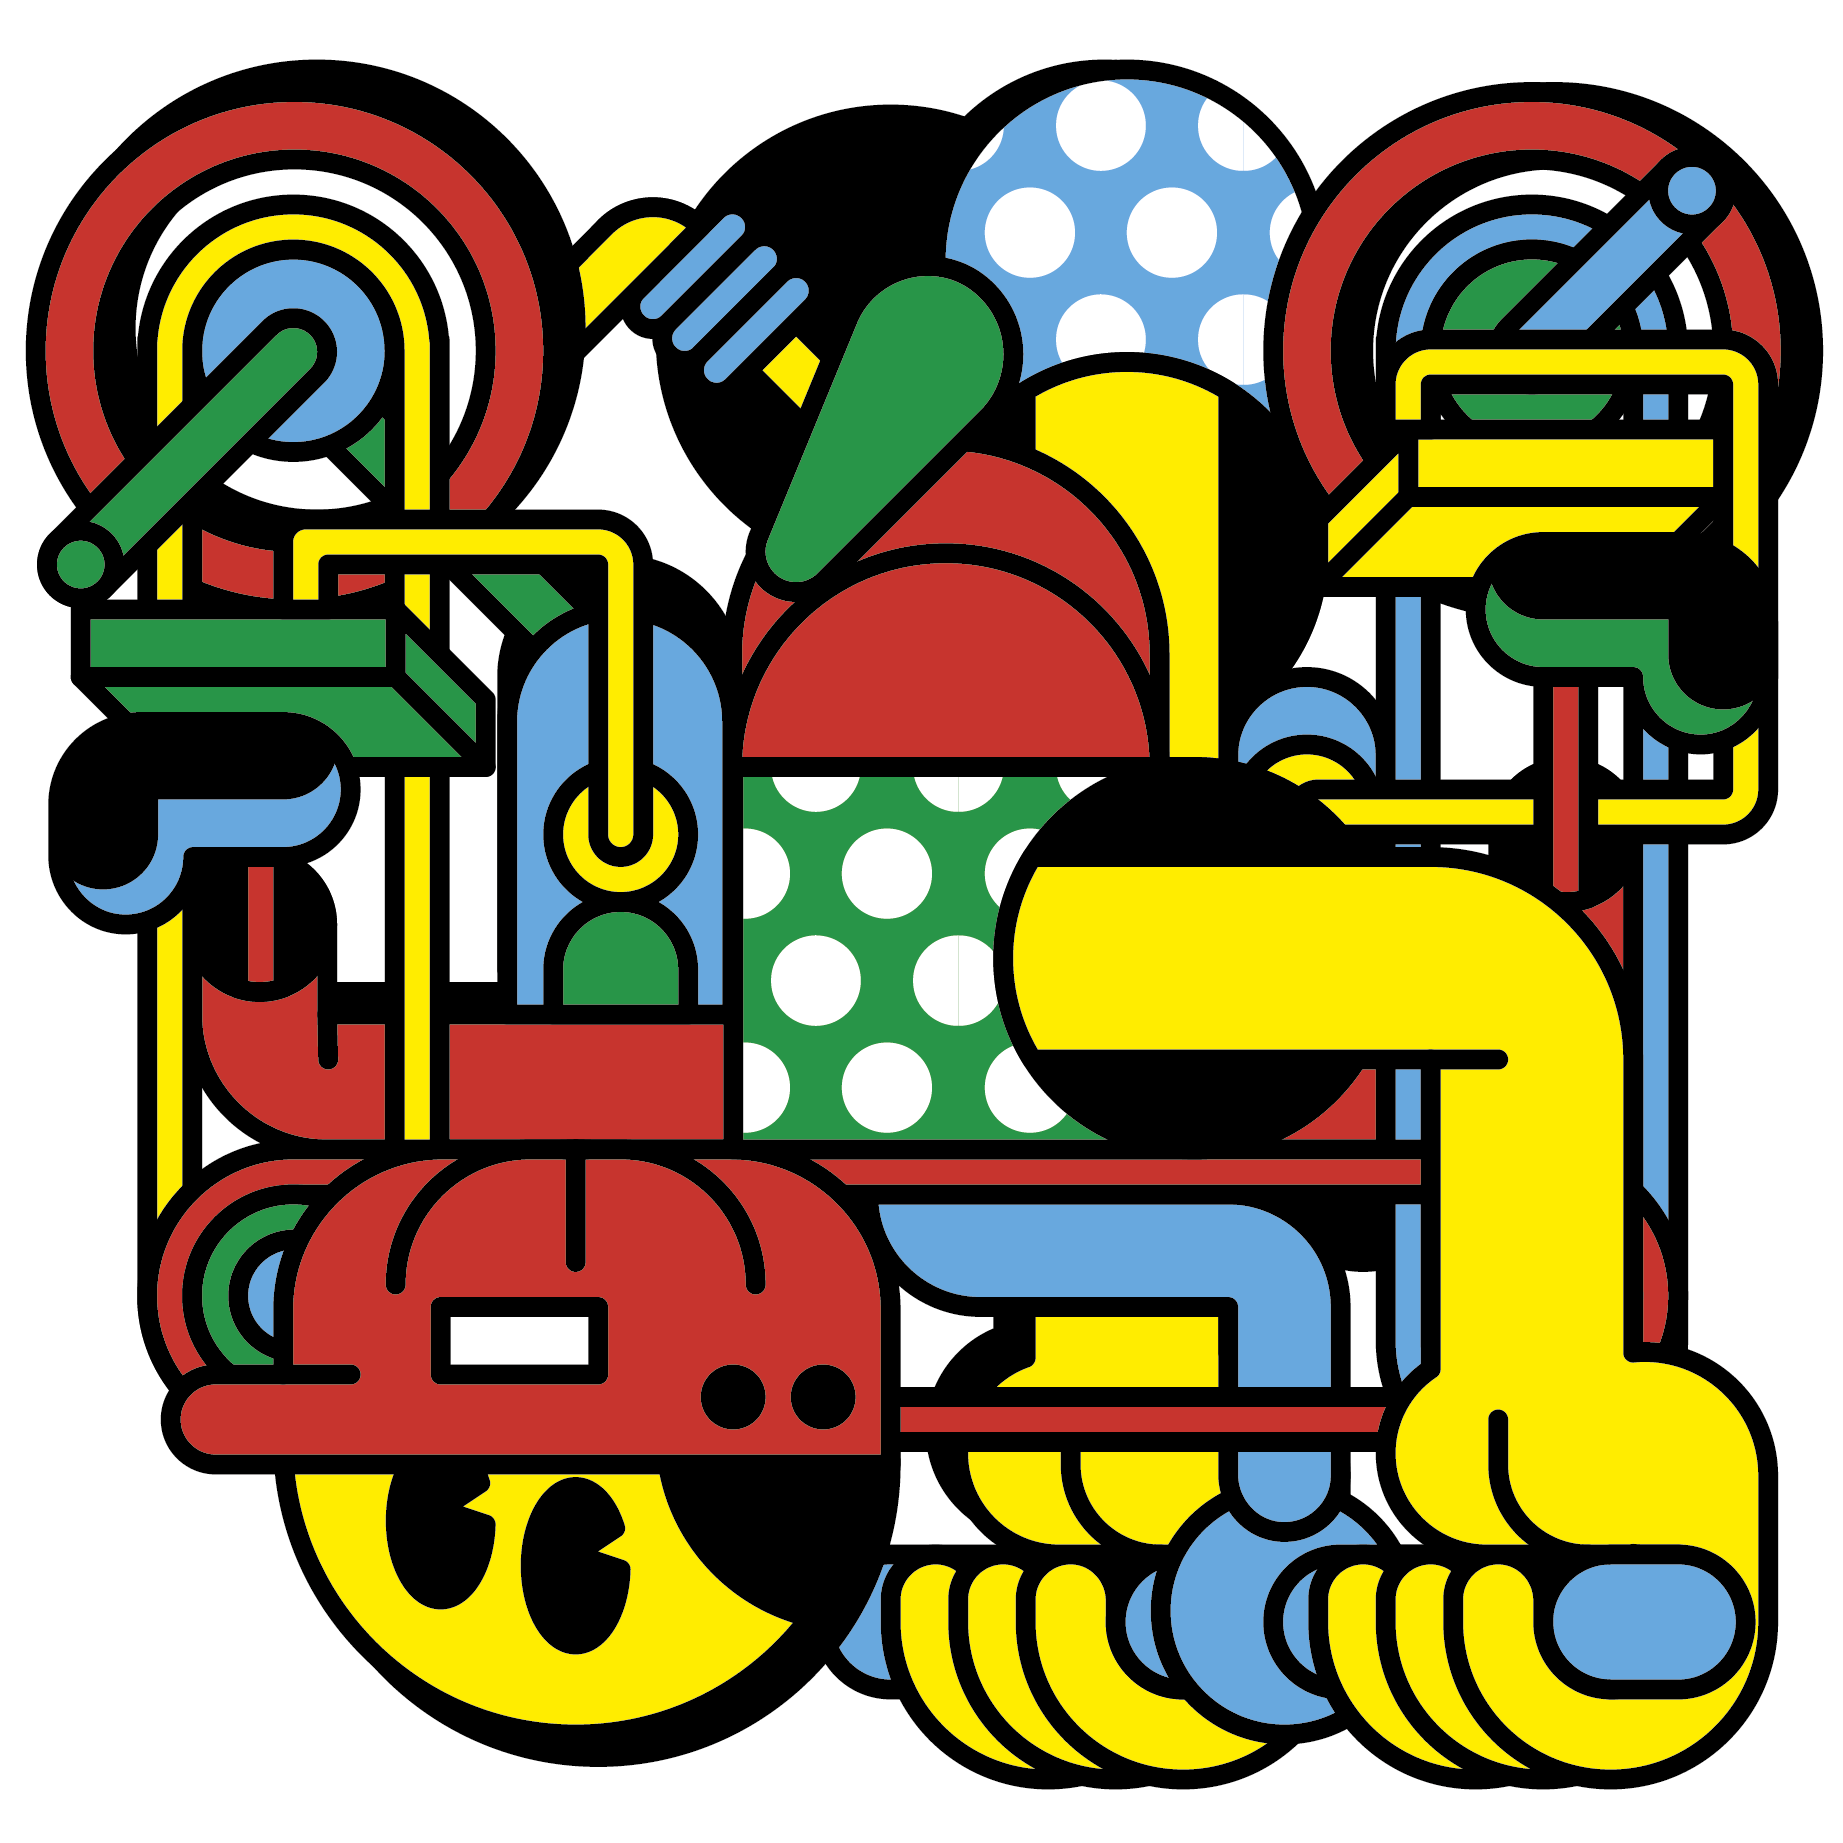 illustrator graphics designer jari johannes